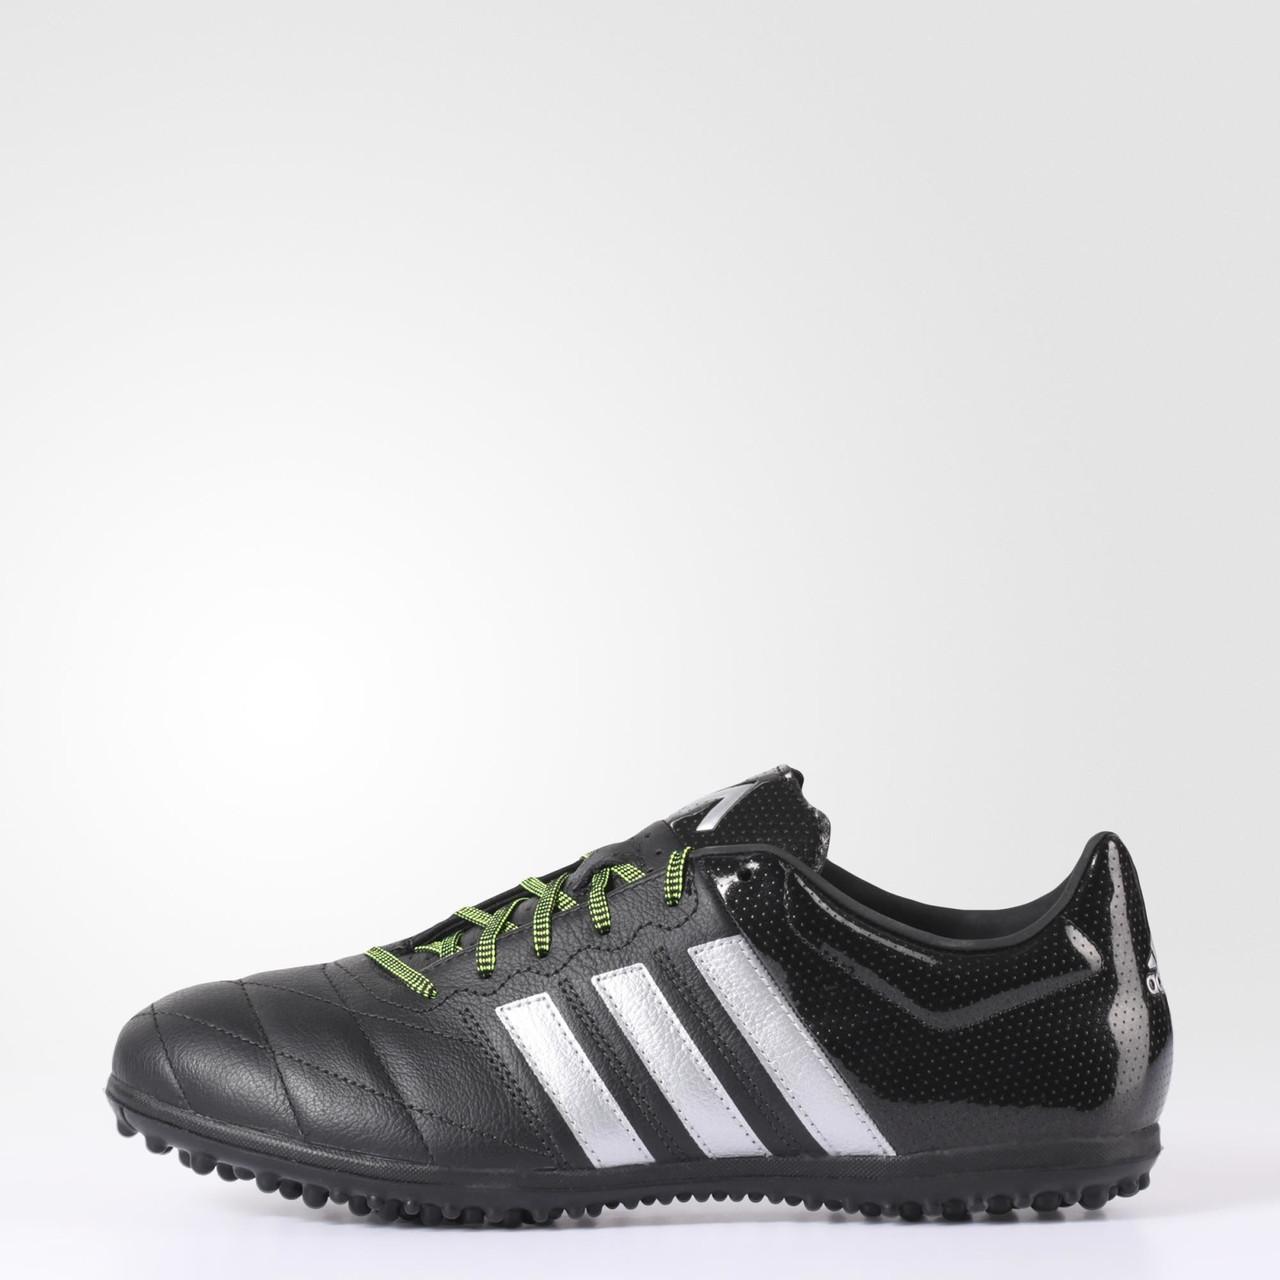 Cороконожки Adidas Ace 15.3 TF Leather S42053